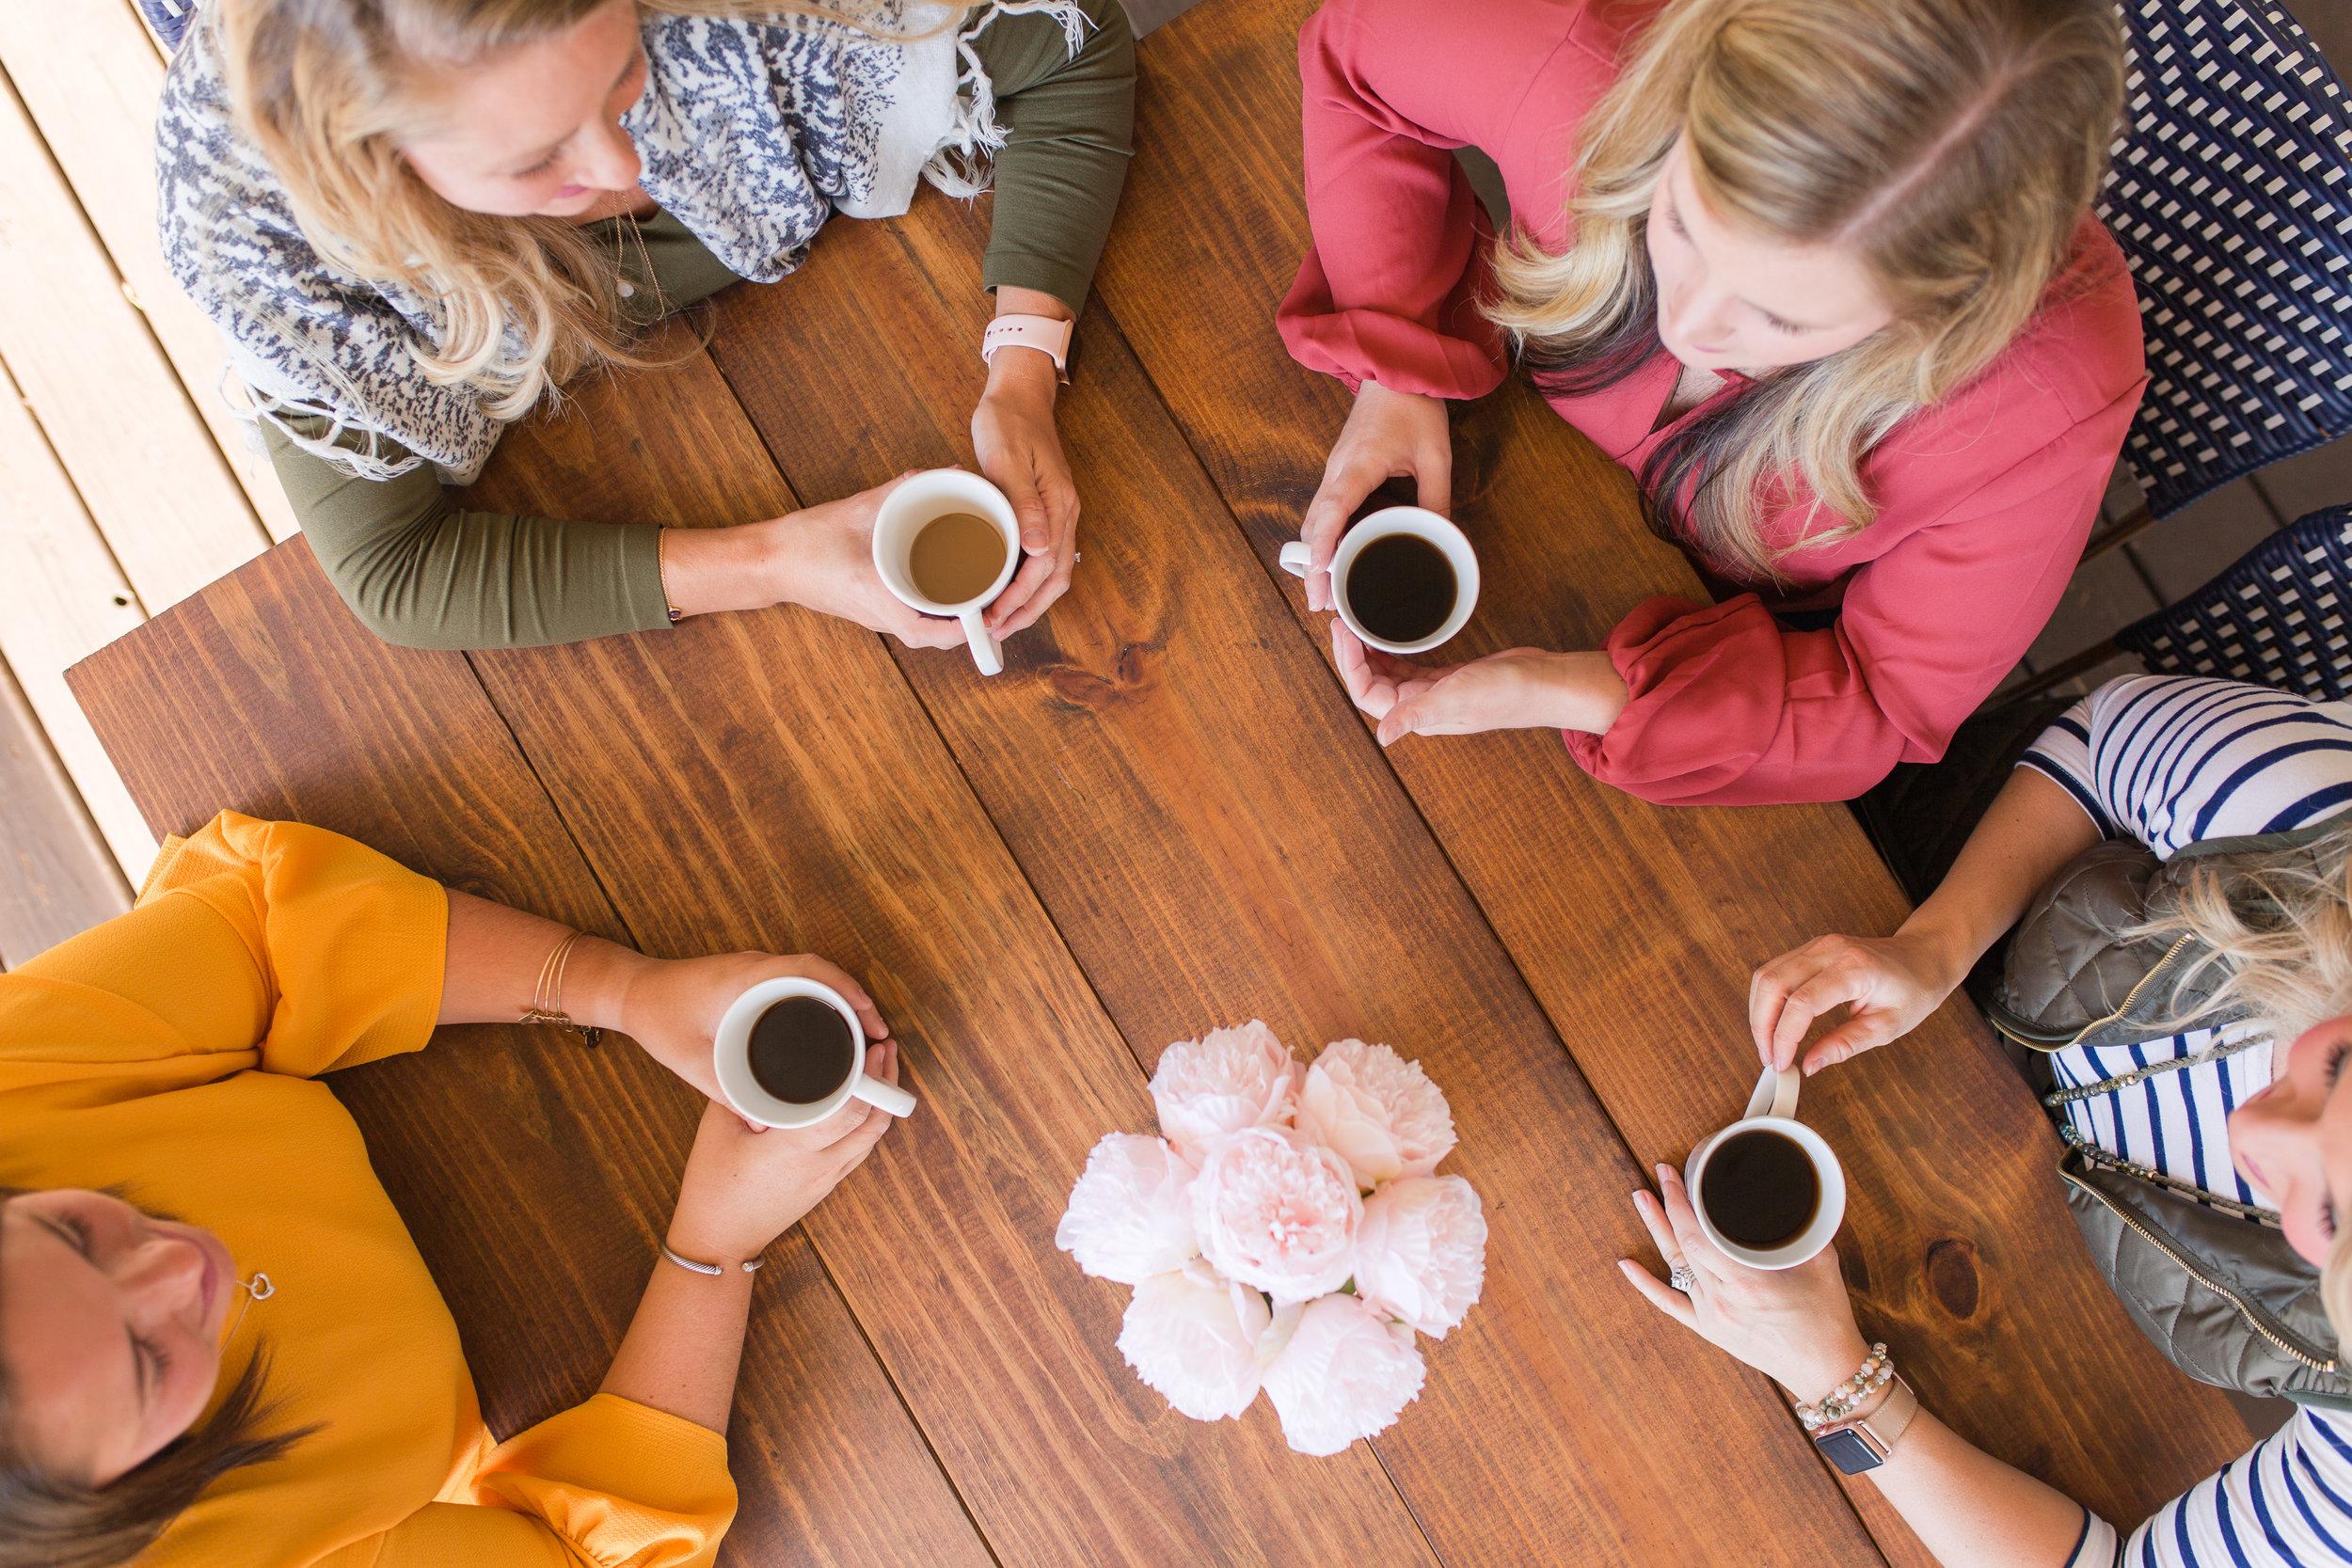 Holy_Mother-preneurs_coffee-3.jpg